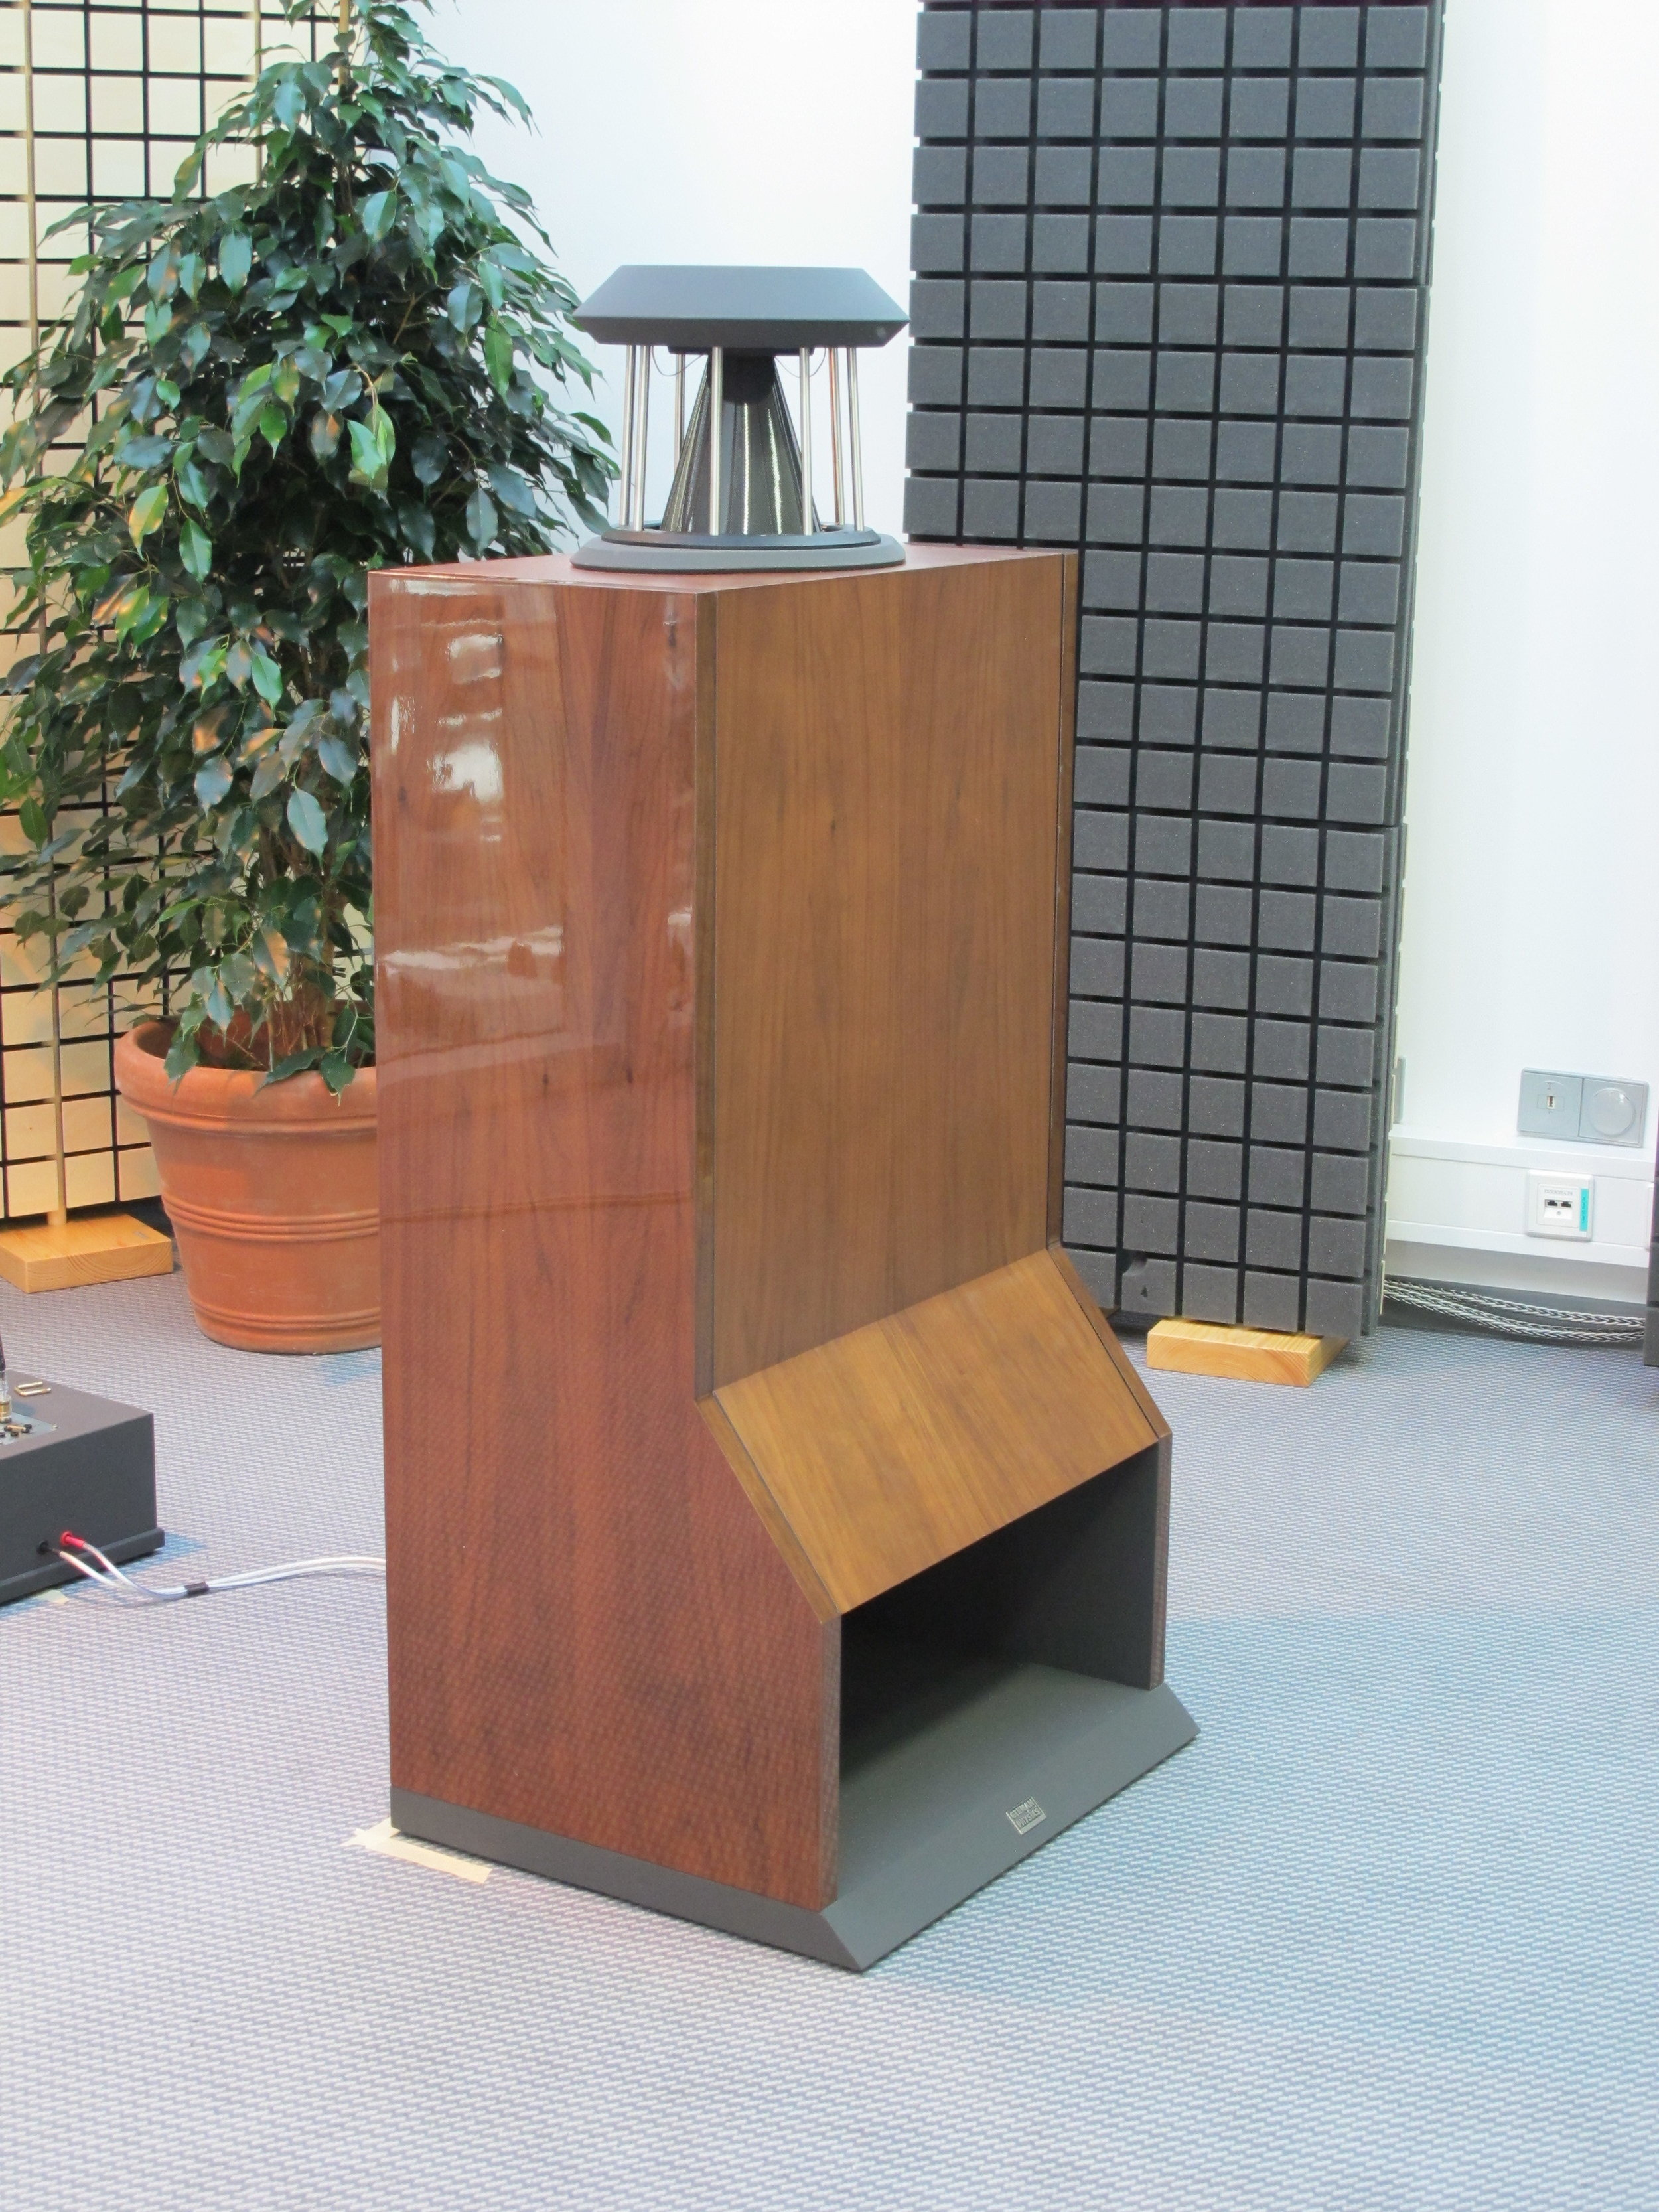 Unicorn MK II loudspeakers in American cherry | Munich Hi-Fi Show 2012, Germany